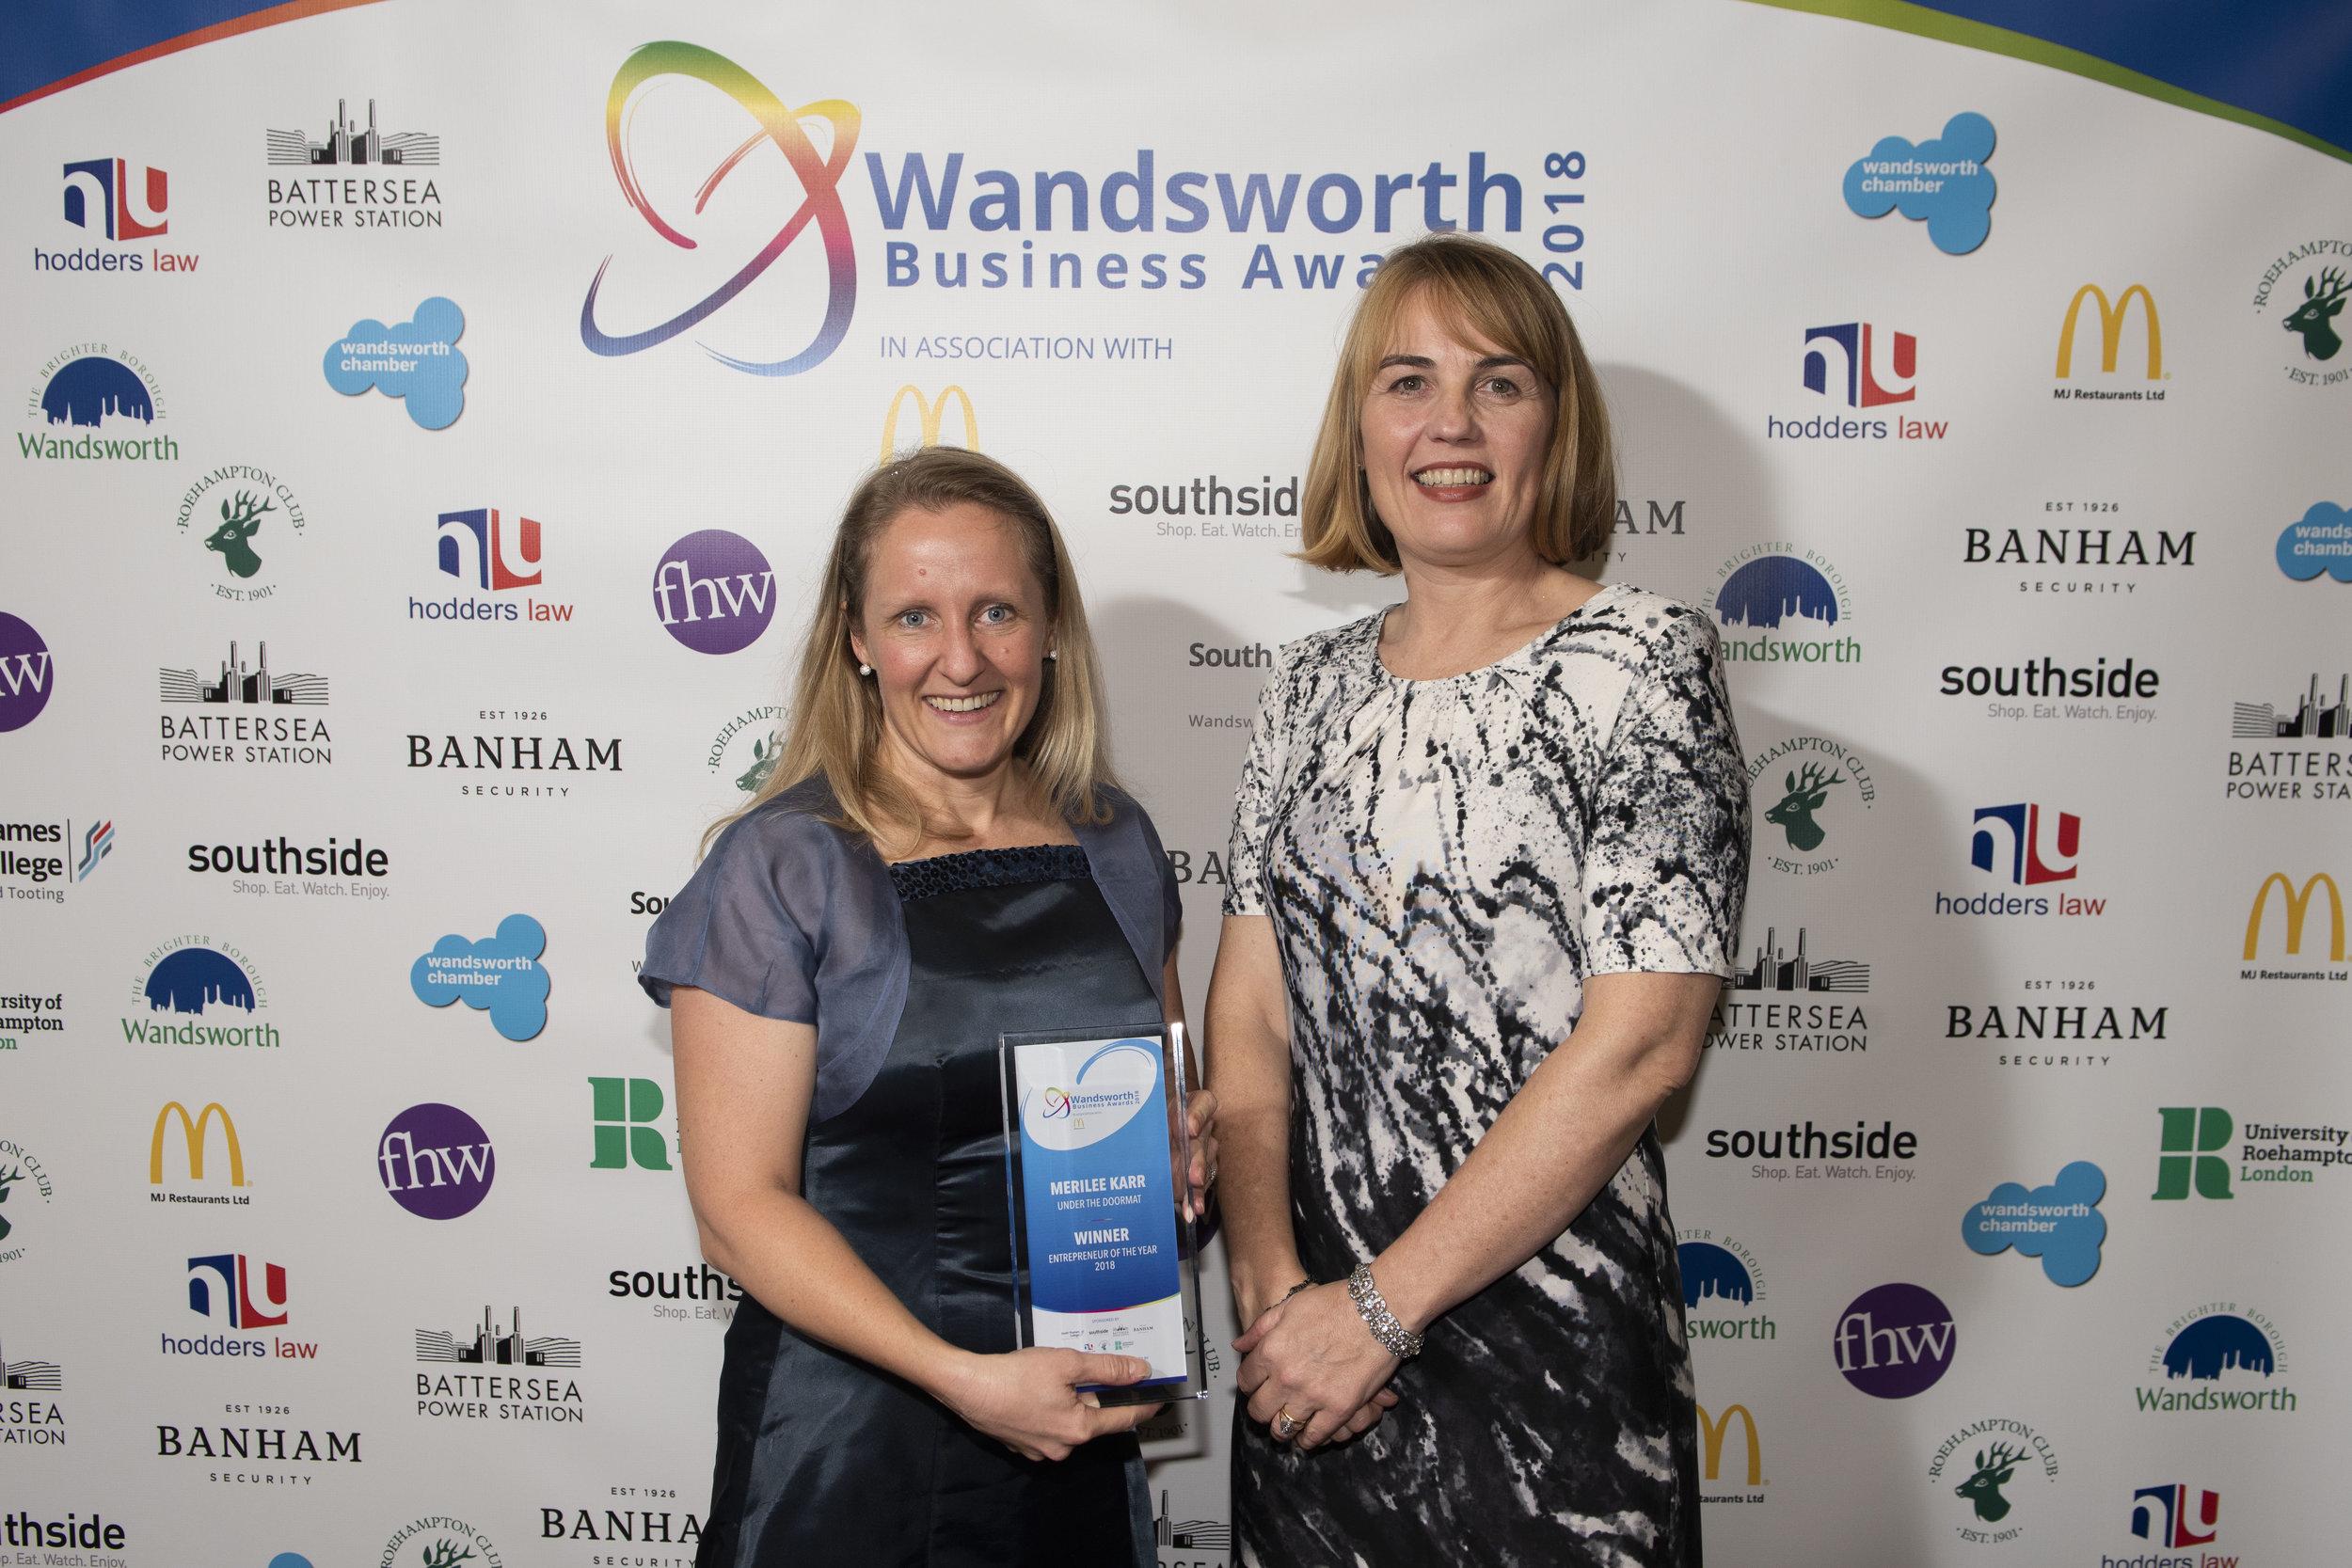 WANDSWORTH-WINNERS-2018_006 entrepreneur.jpg